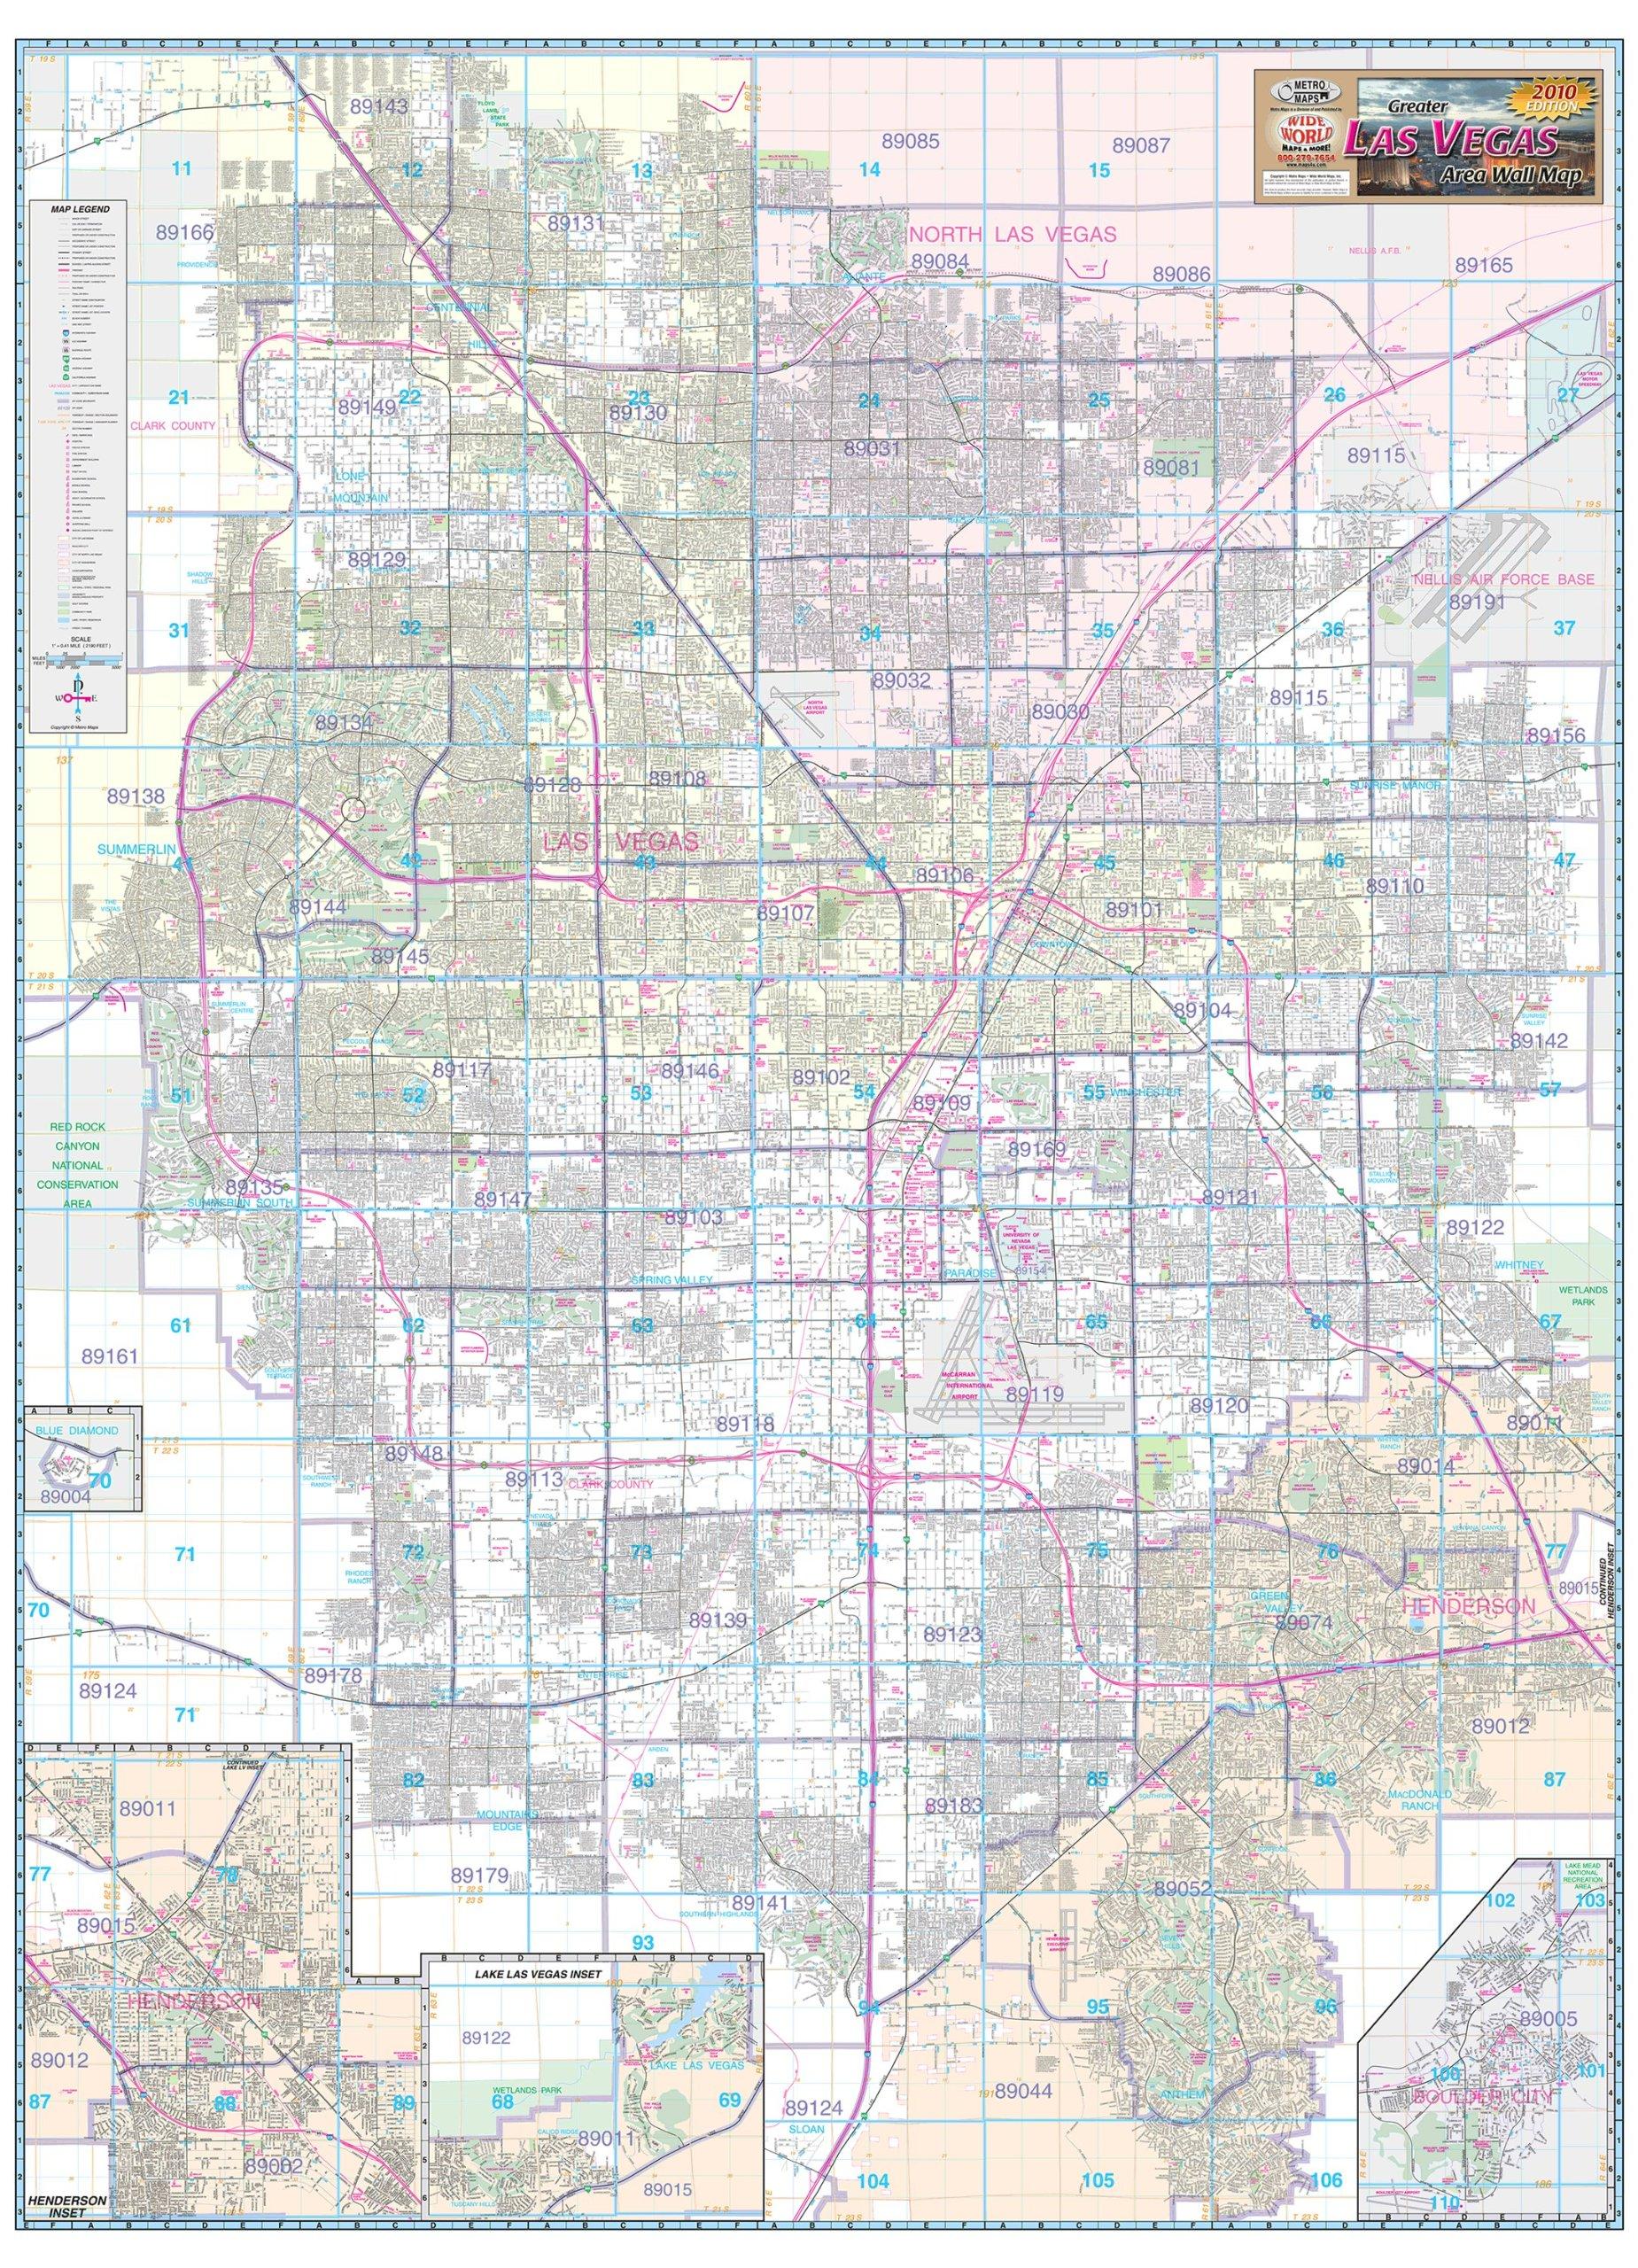 Greater Las Vegas Area Wall Map Gloss Laminated Amazon Com Books